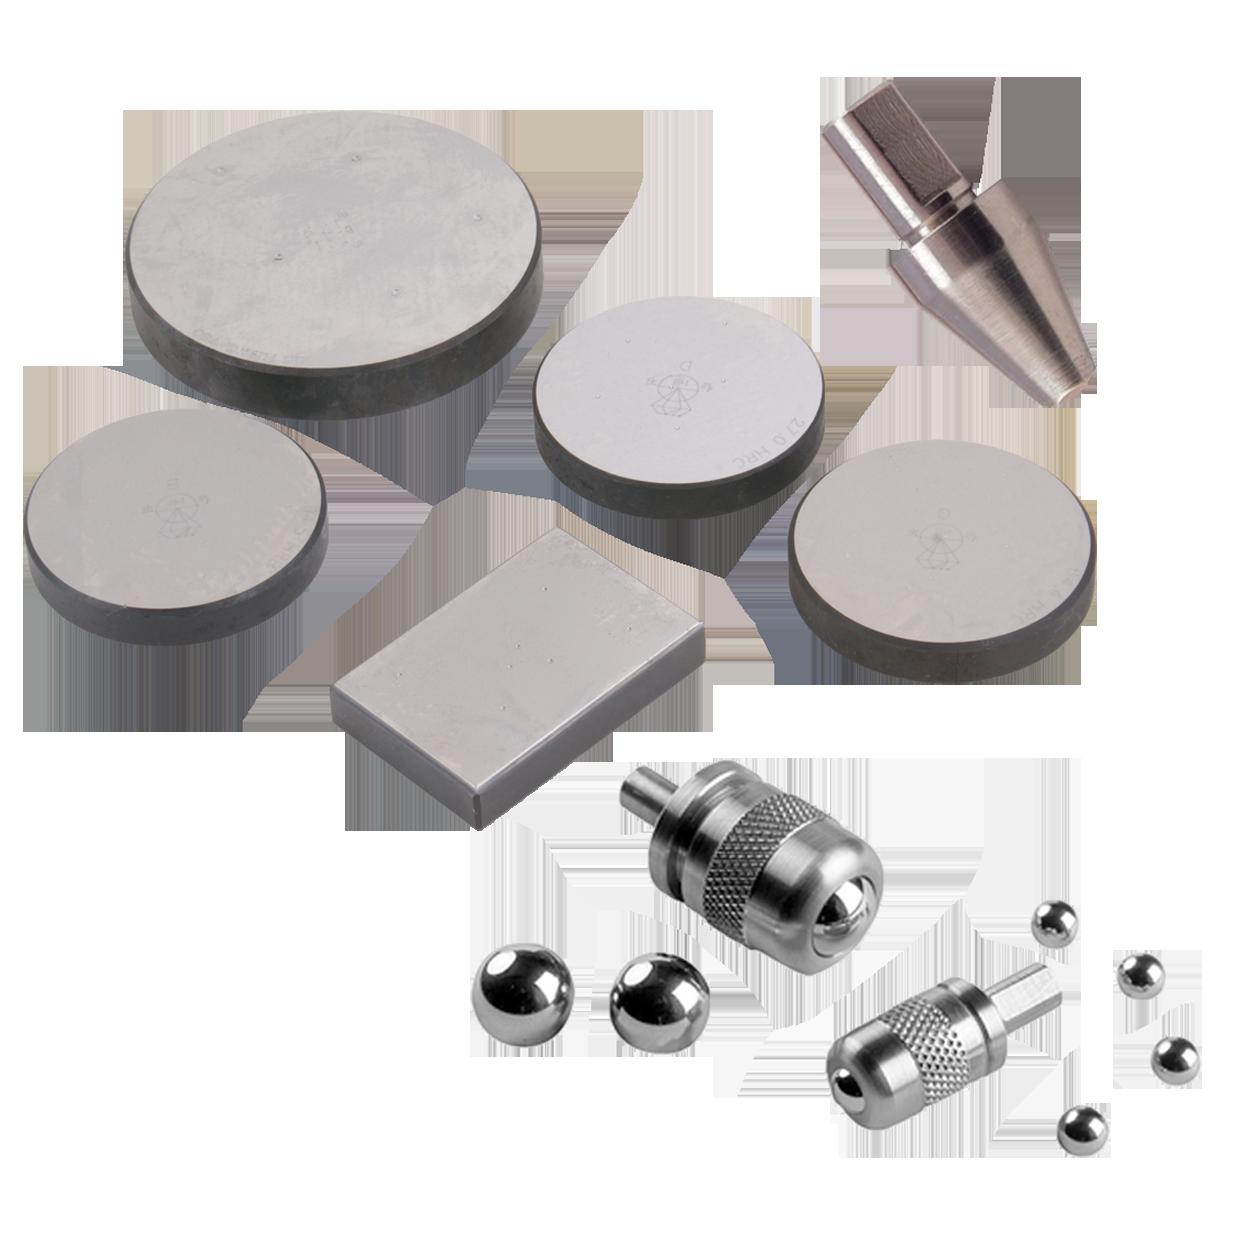 Metallographic abrasive blades